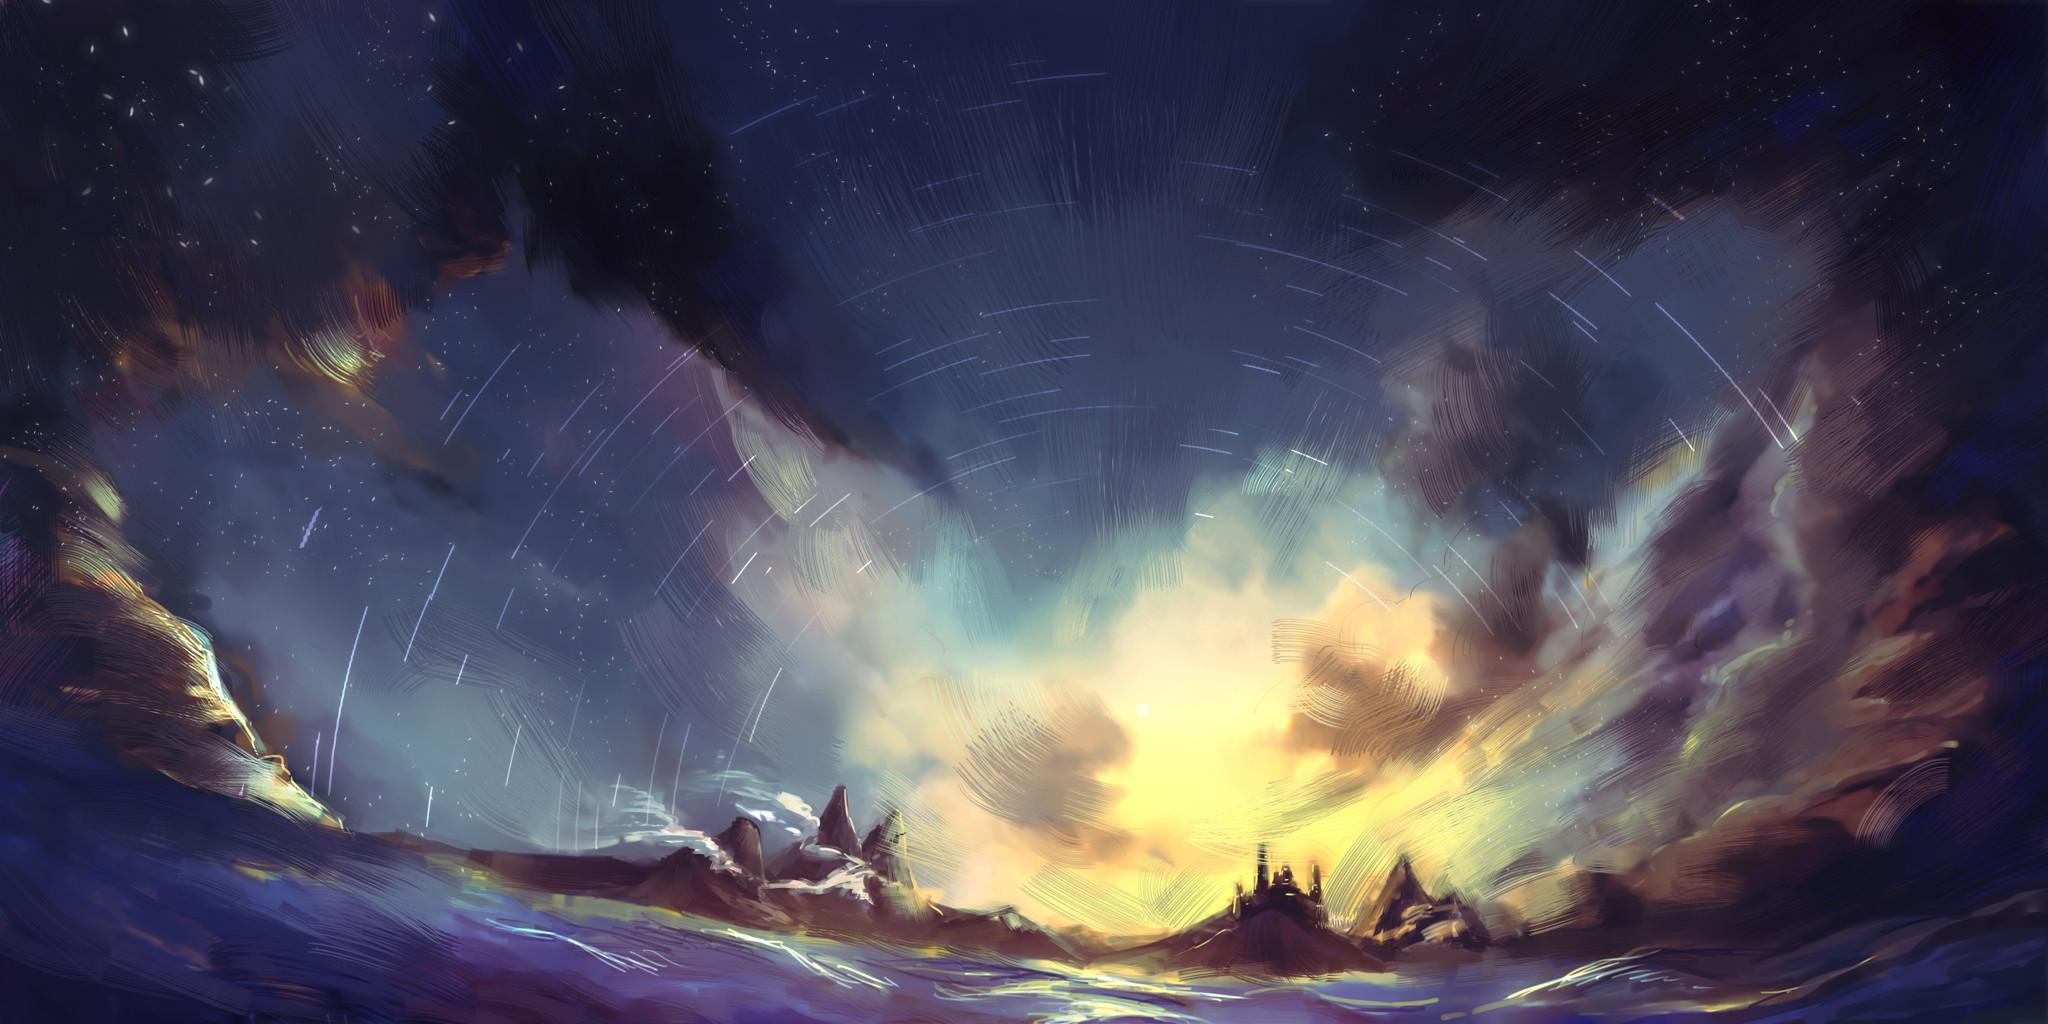 pixiv wallpaper,sky,atmosphere,cloud,geological phenomenon,space